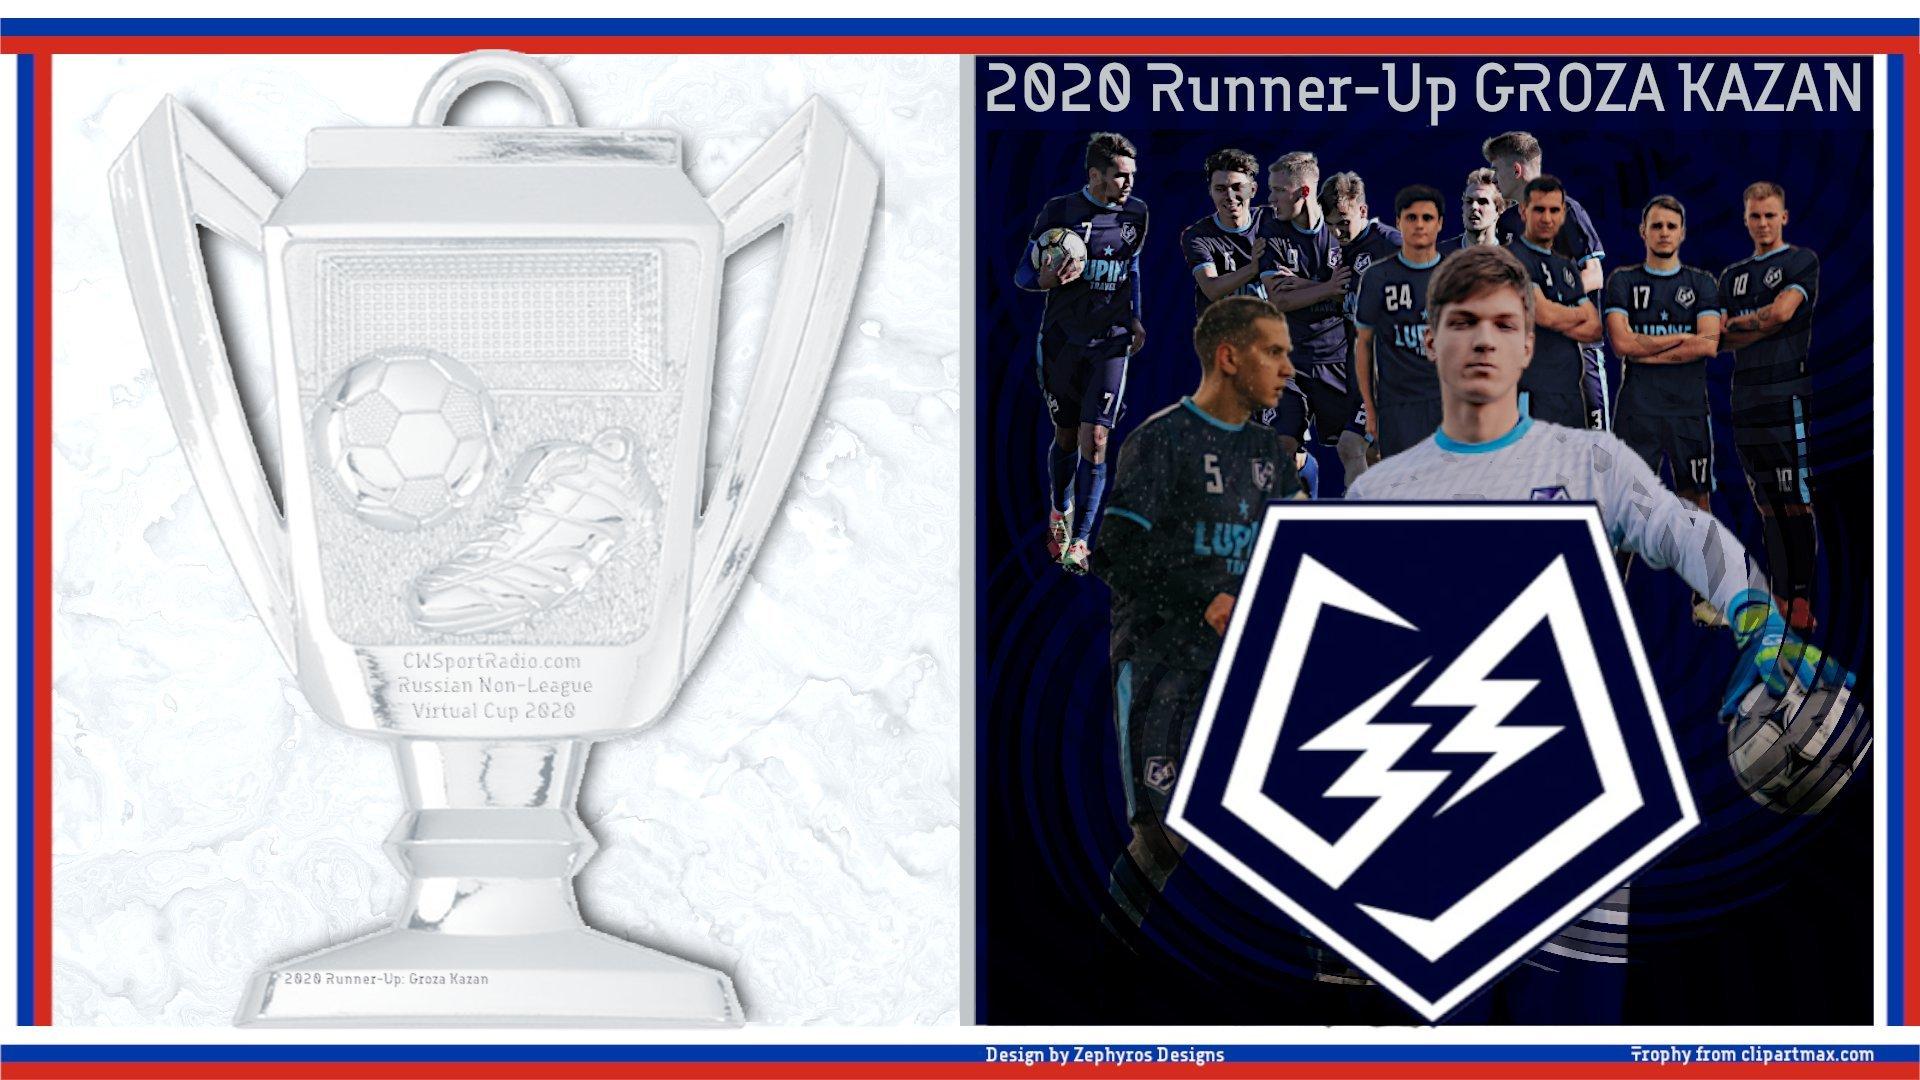 Приняли участие в Russian Non-League Virtual Cup 2020